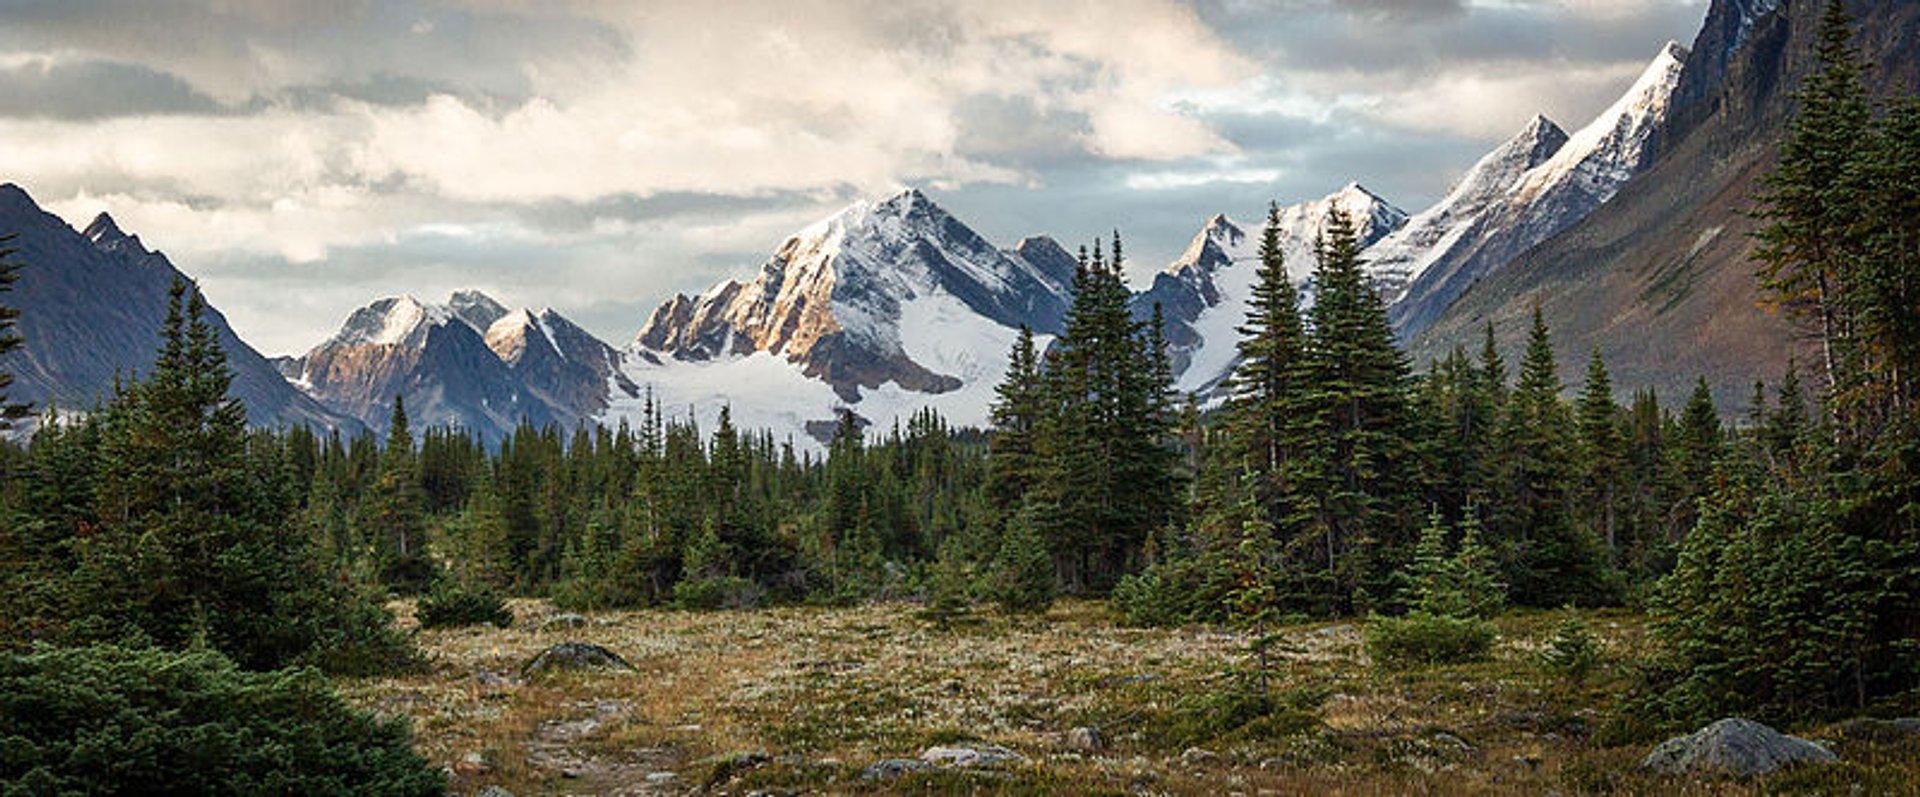 Tonquin Valley Hike in Banff & Jasper National Parks - Best Season 2020